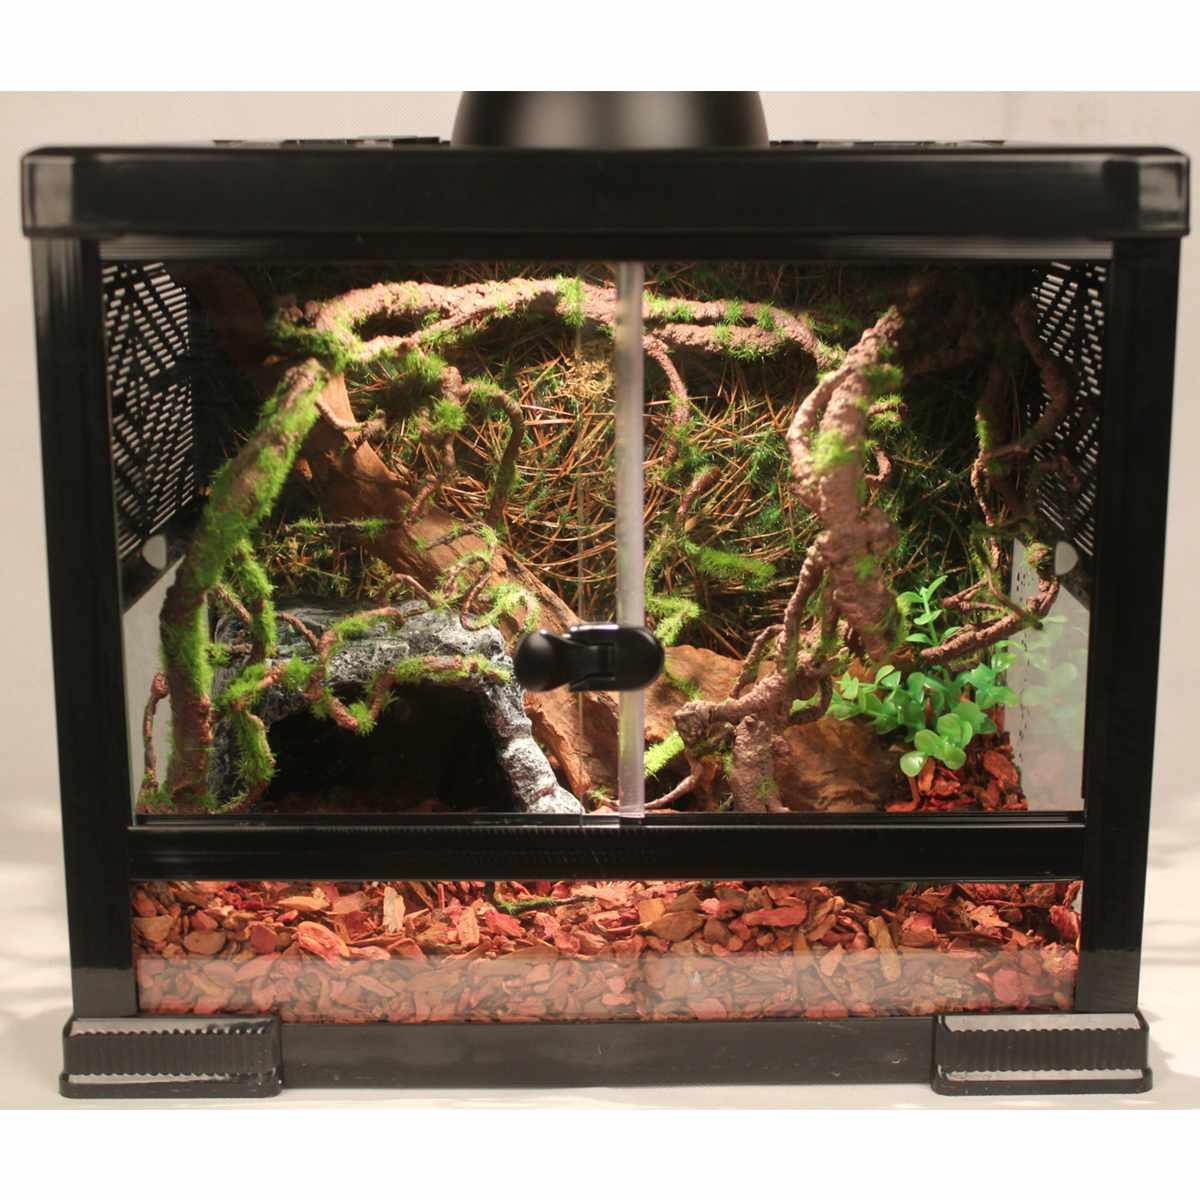 120cm Reptiles Box Tank Vine Climber Jungle Forest Bend Artificial Branch Terrarium Cage Decoration Reptiles Habitat Ornament